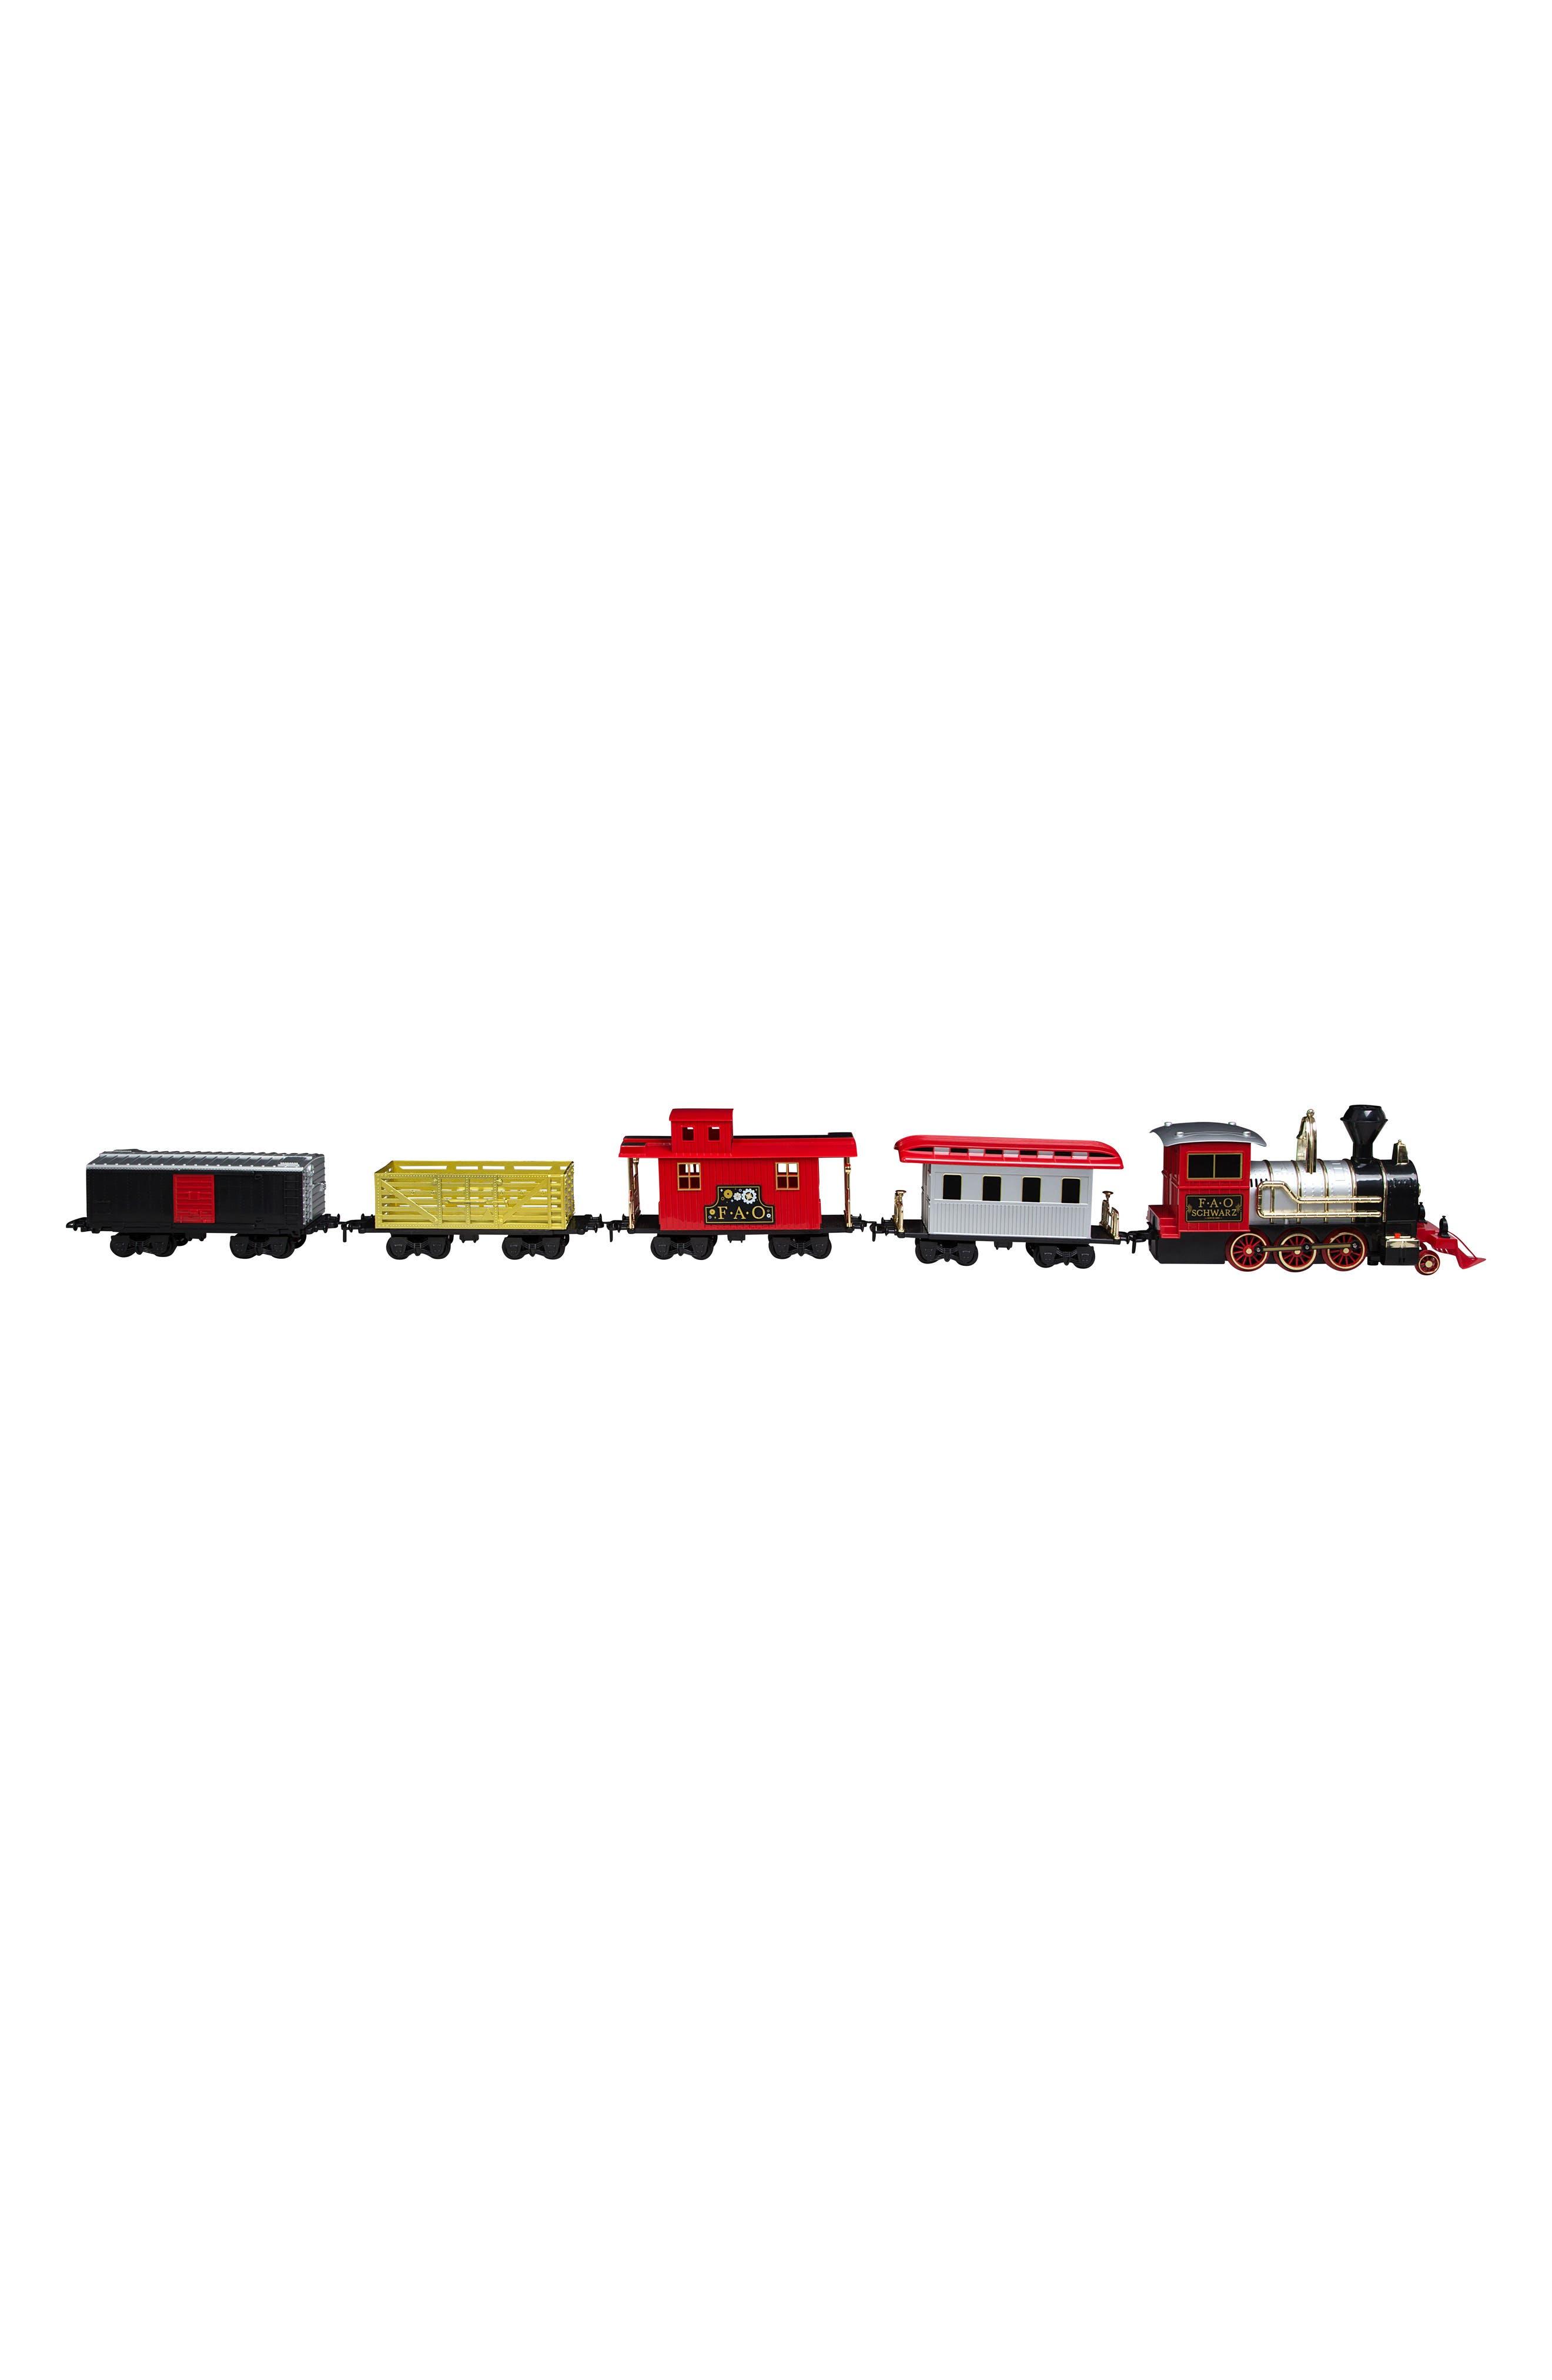 75-Piece Train Set,                             Main thumbnail 1, color,                             RED